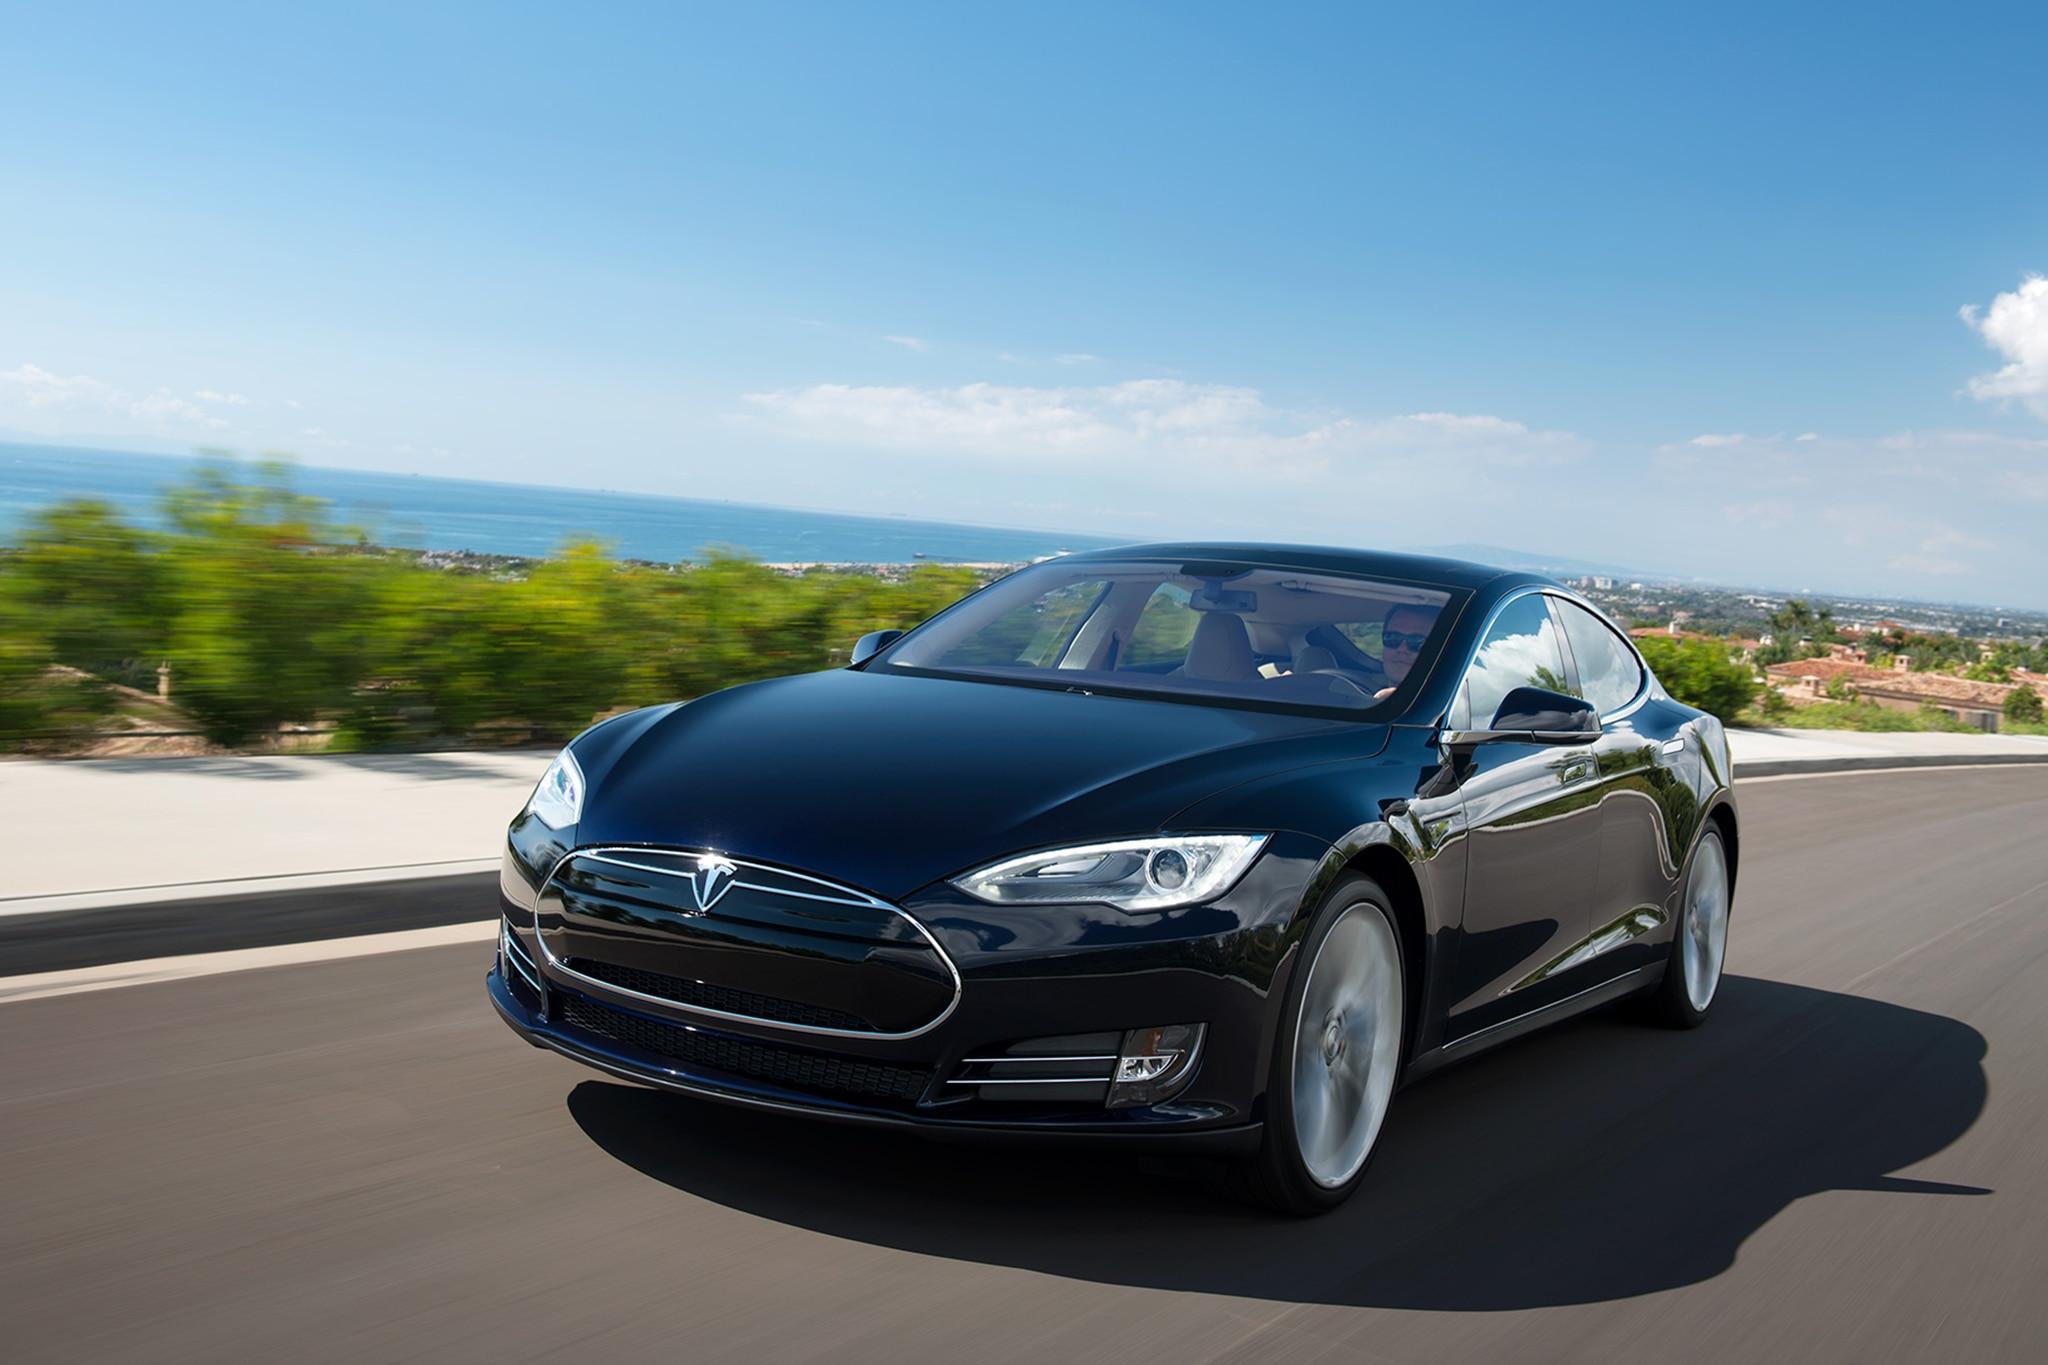 2014 Tesla Model S Three Quarters In Motion2